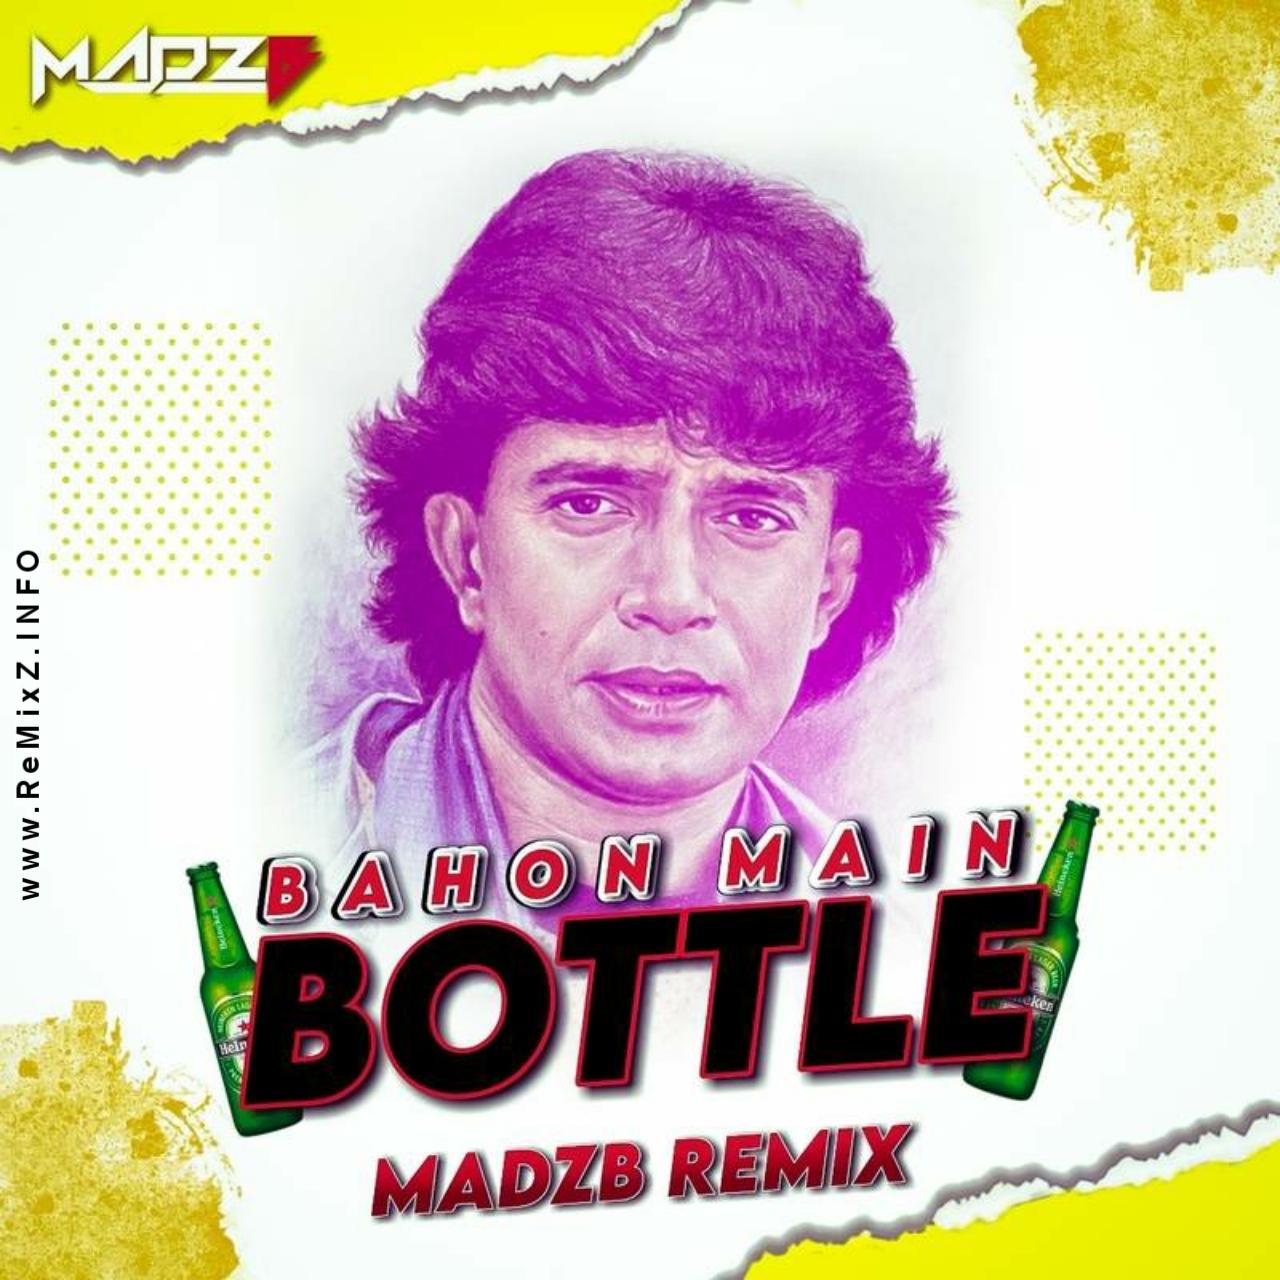 bahon-main-bottle-madzb-remix.jpg